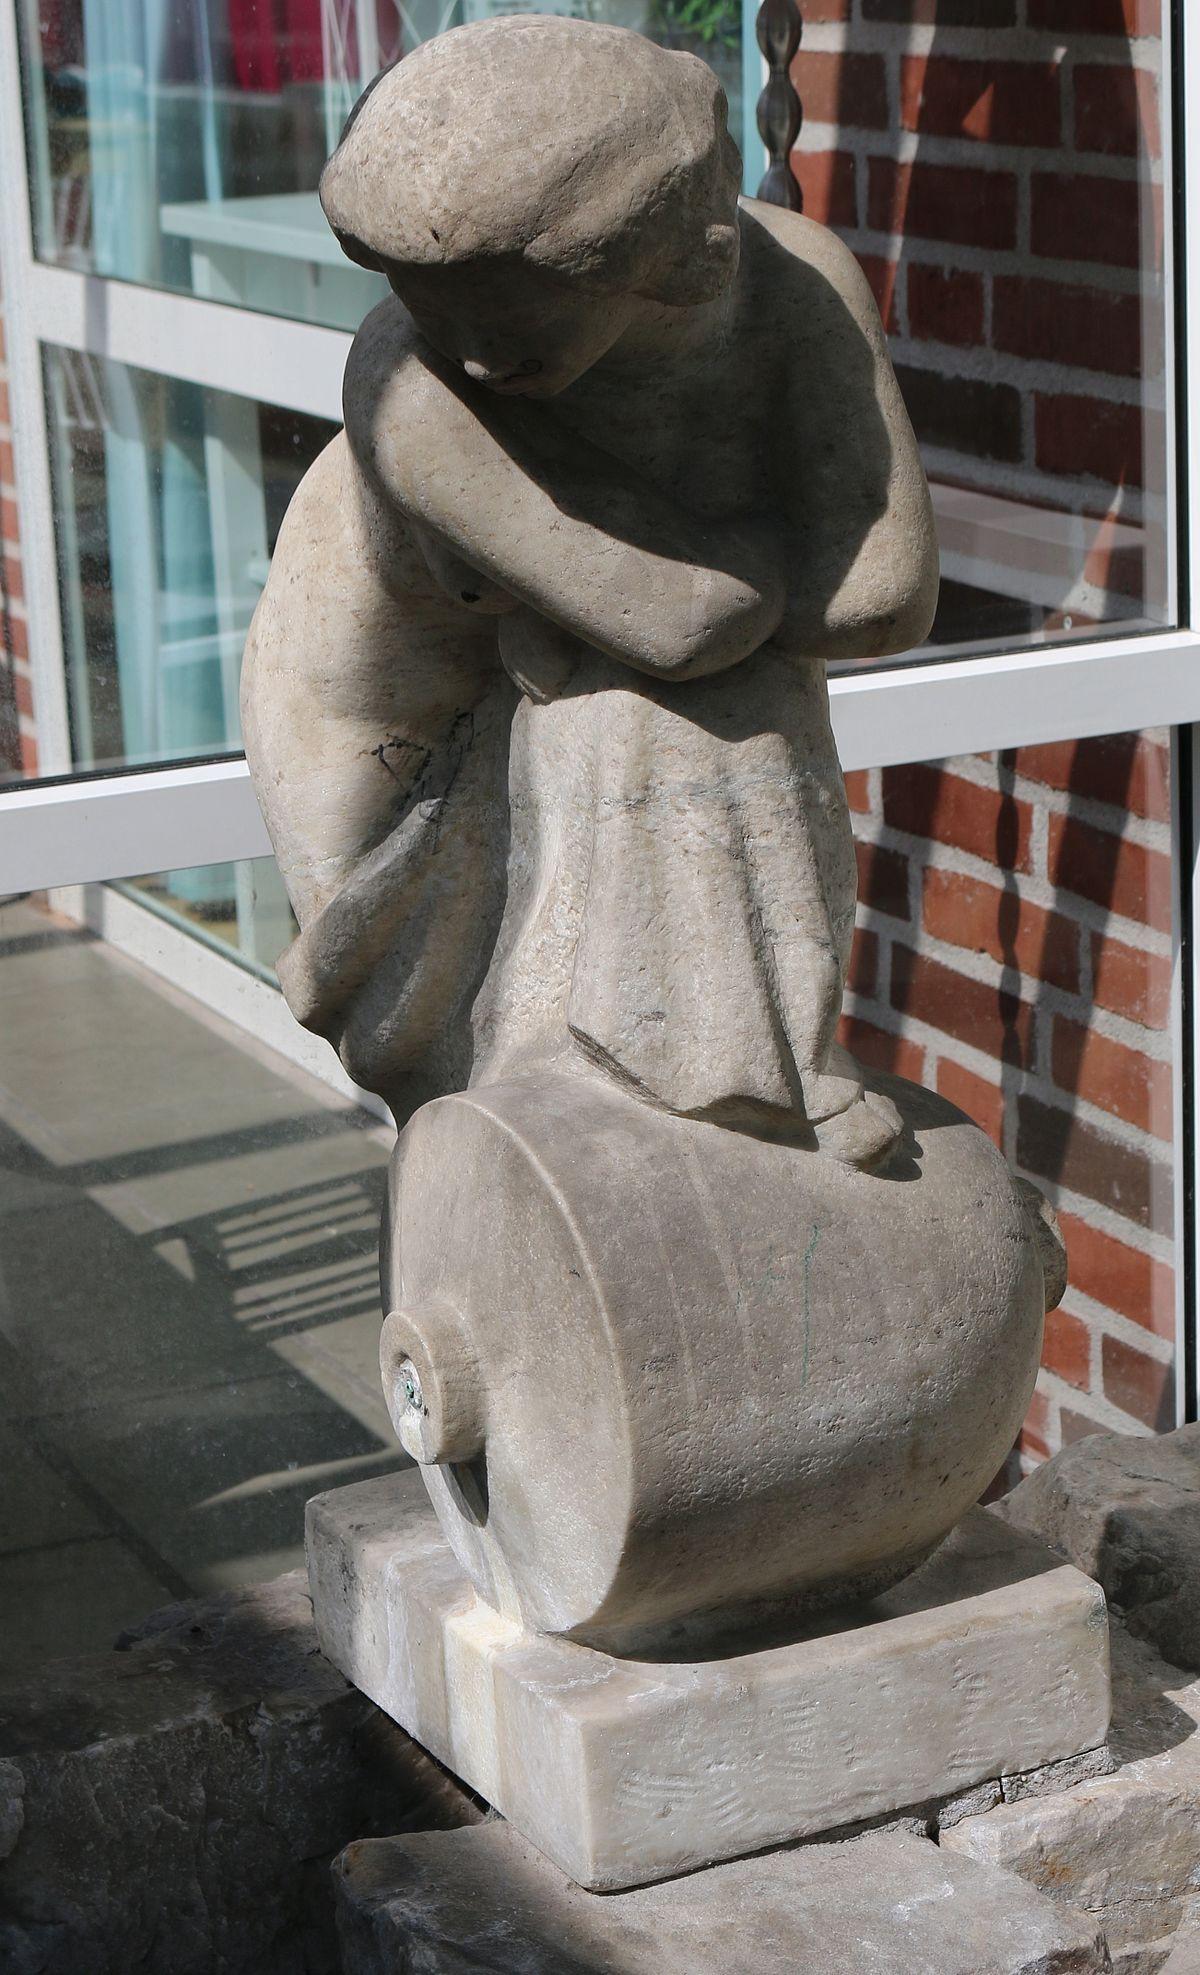 Karta Skulpturer Boras.Lista Over Offentlig Konst I Simrishamns Kommun Wikipedia